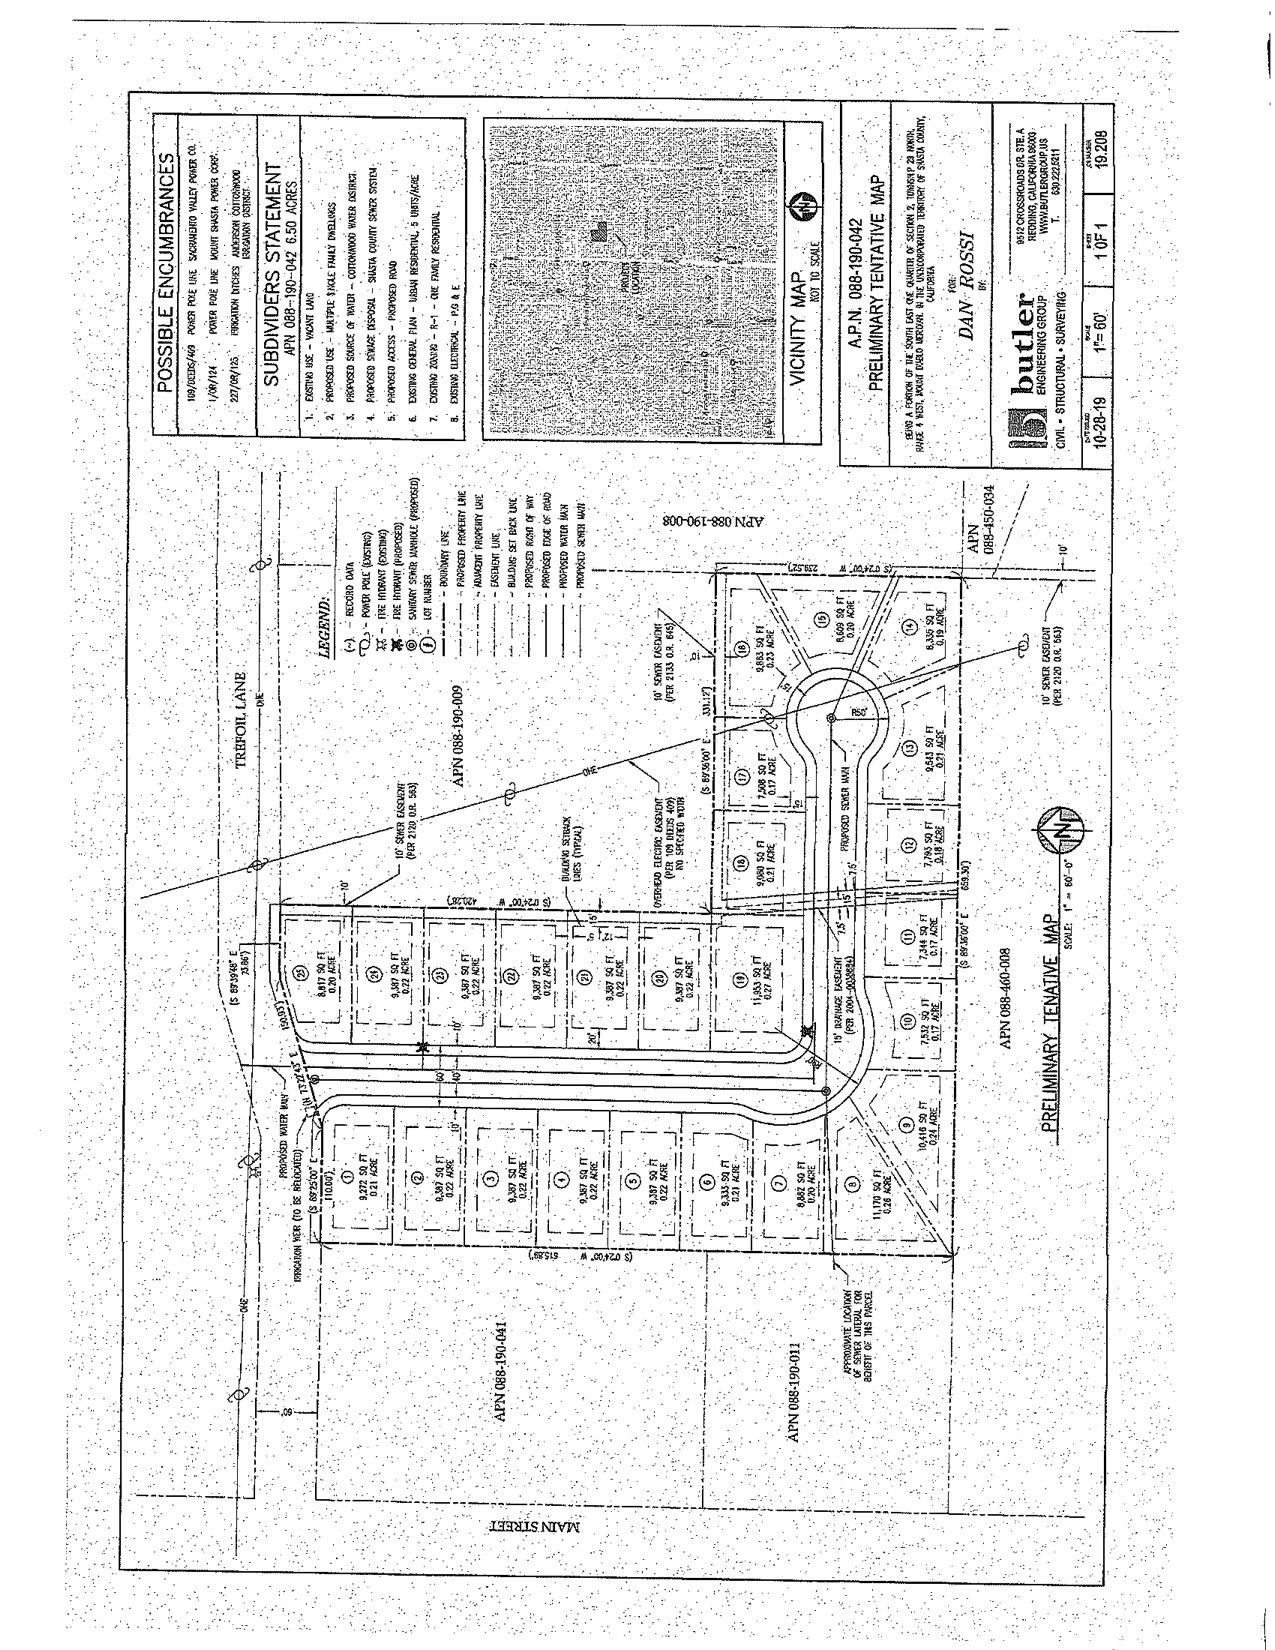 Photo of Trefoil, Cottonwood, CA 96022 (MLS # 19-6257)